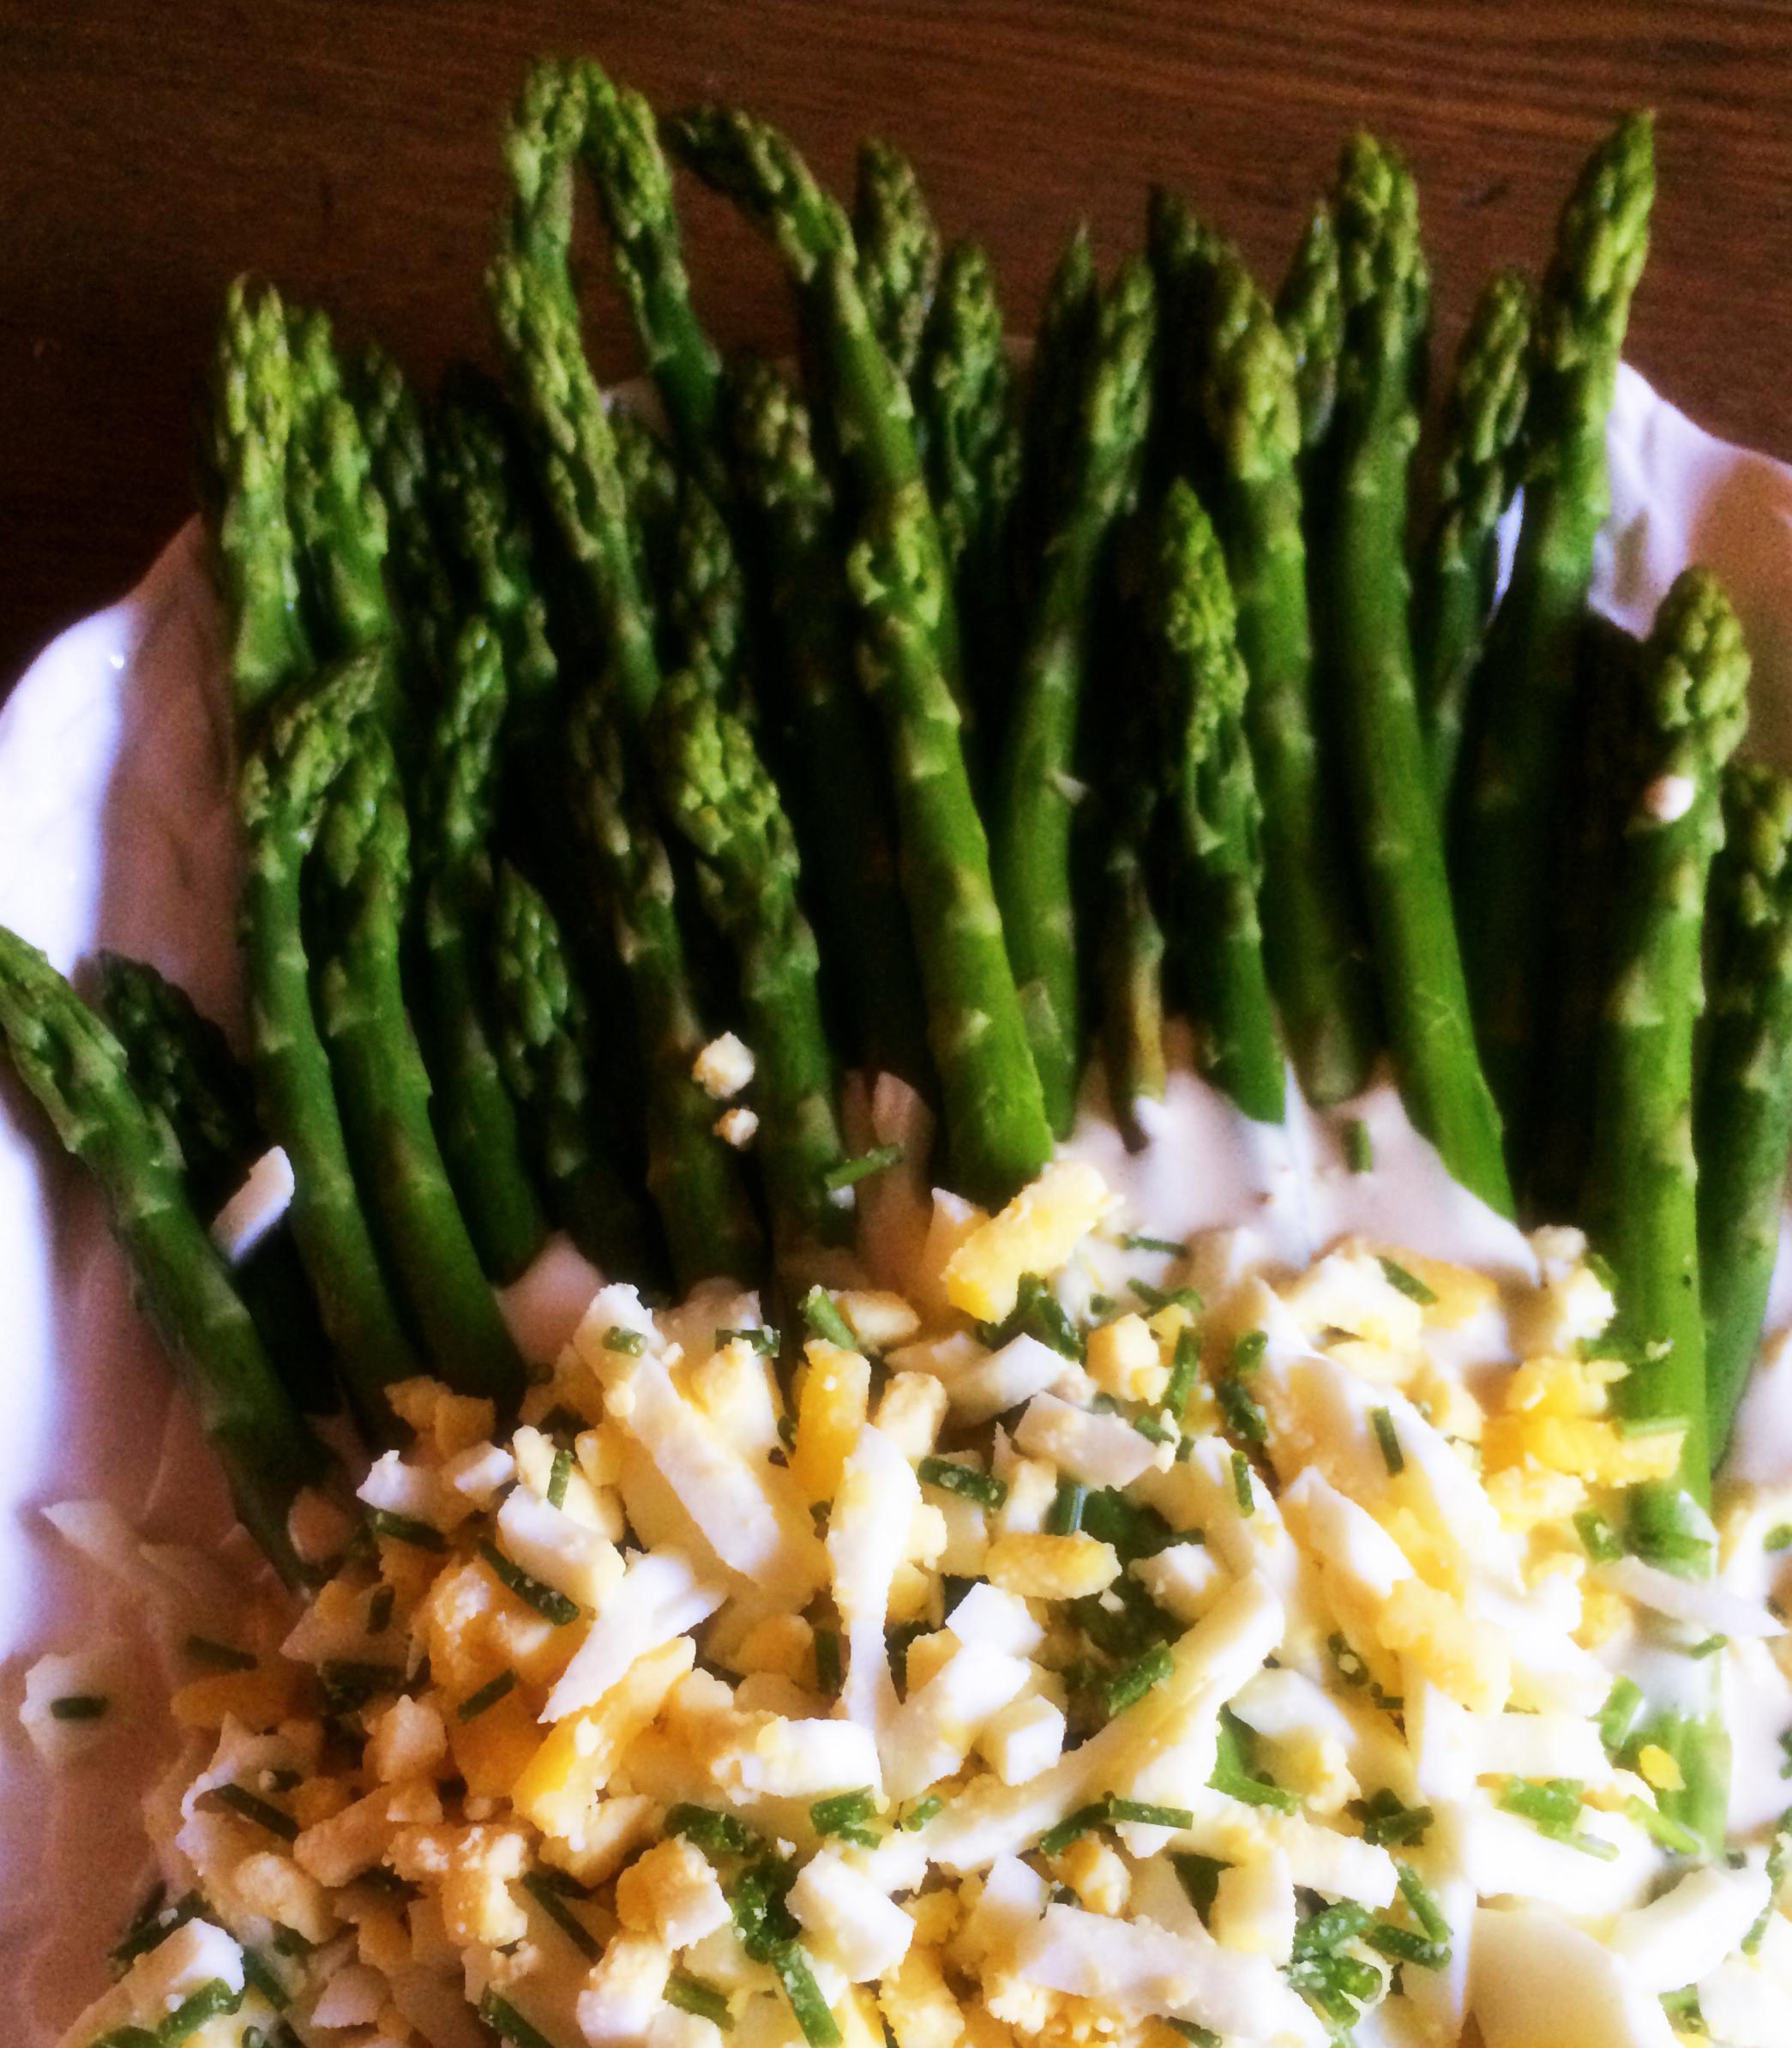 Asparagus with Mustard Sauce